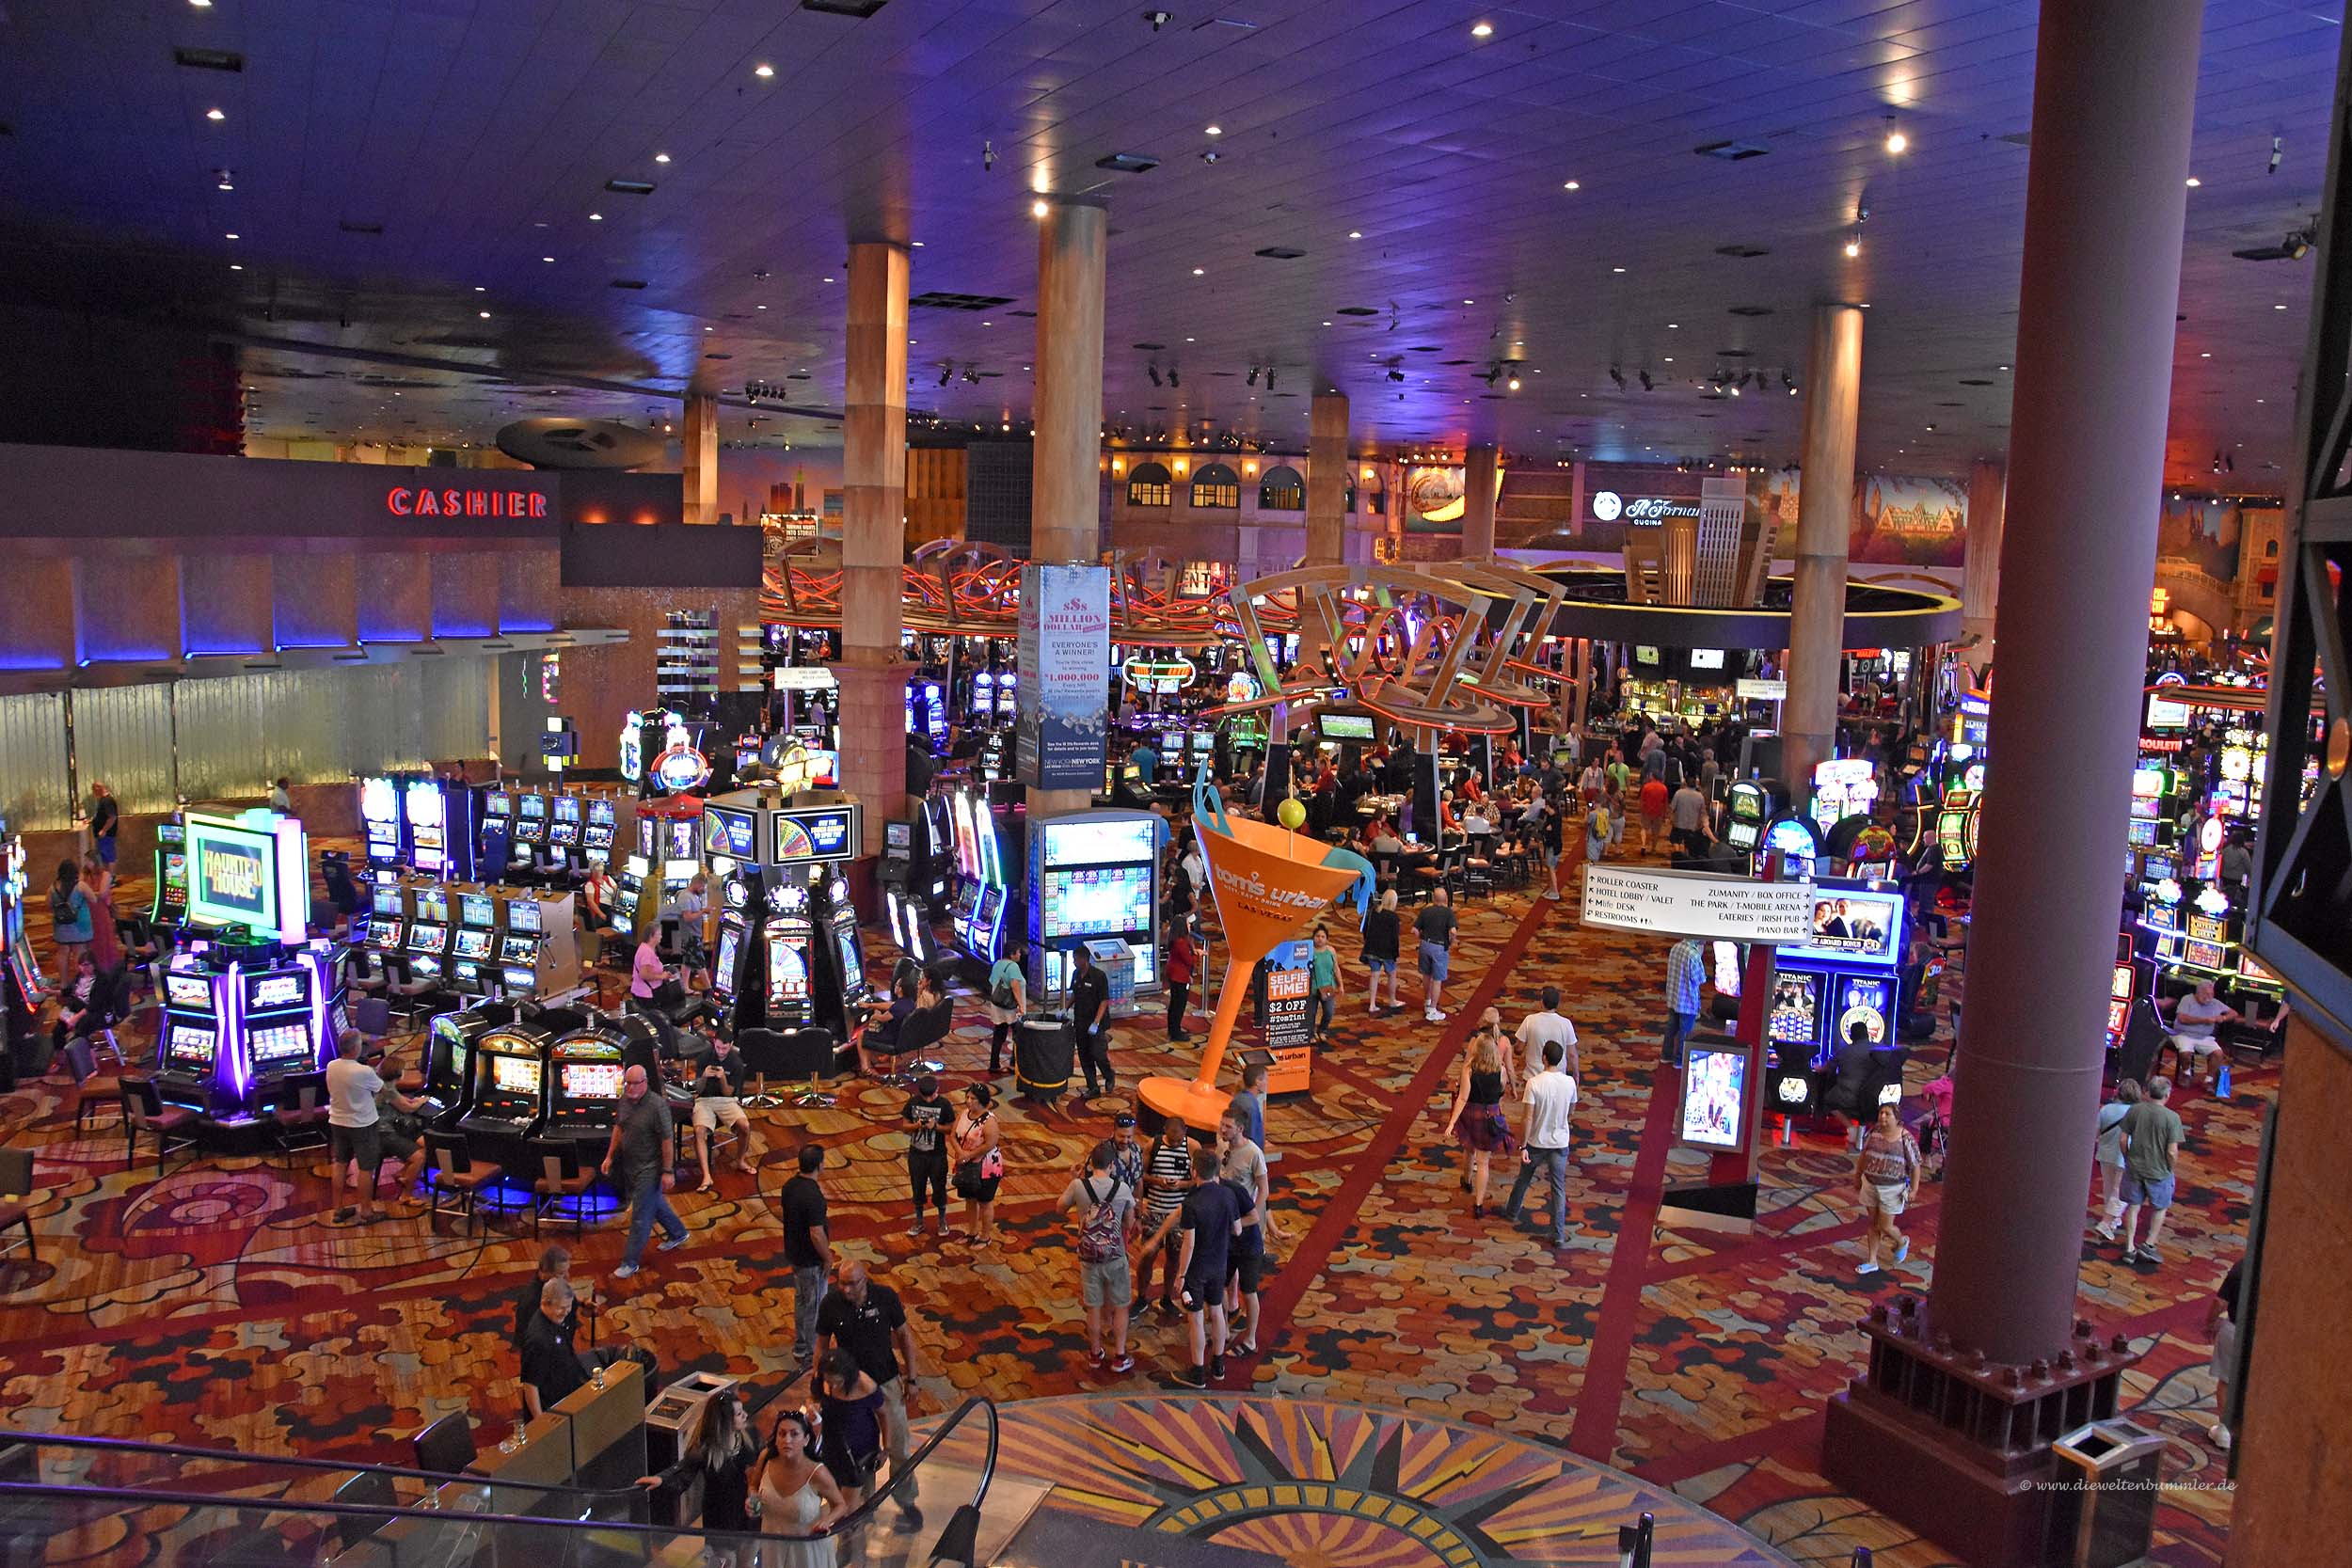 Casino vom Hotel New York